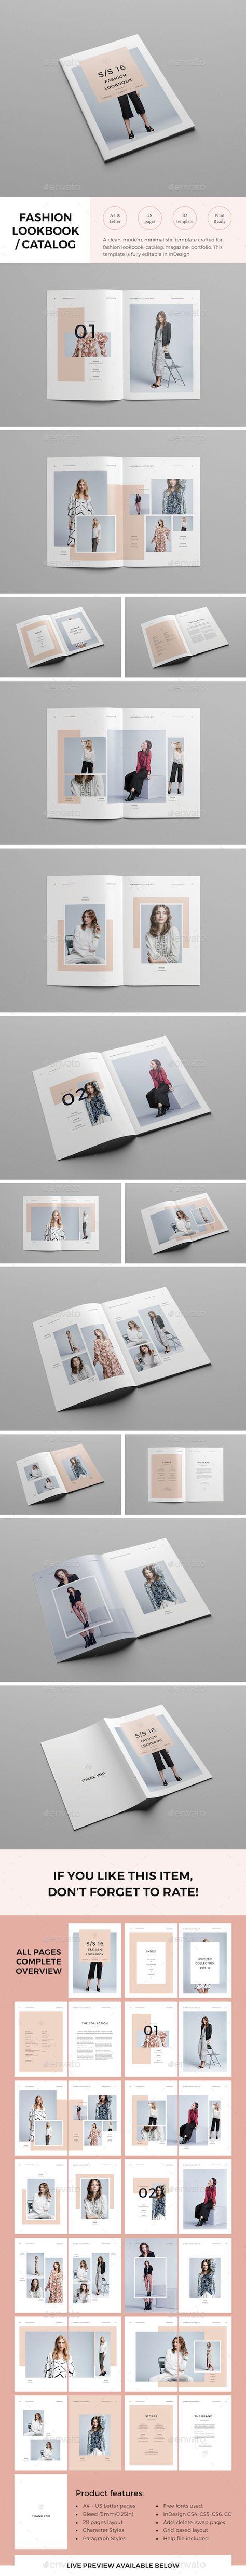 Lookbook Template InDesign INDD. Download here: http://graphicriver.net/item/lookbook-template/15315869?ref=ksioks